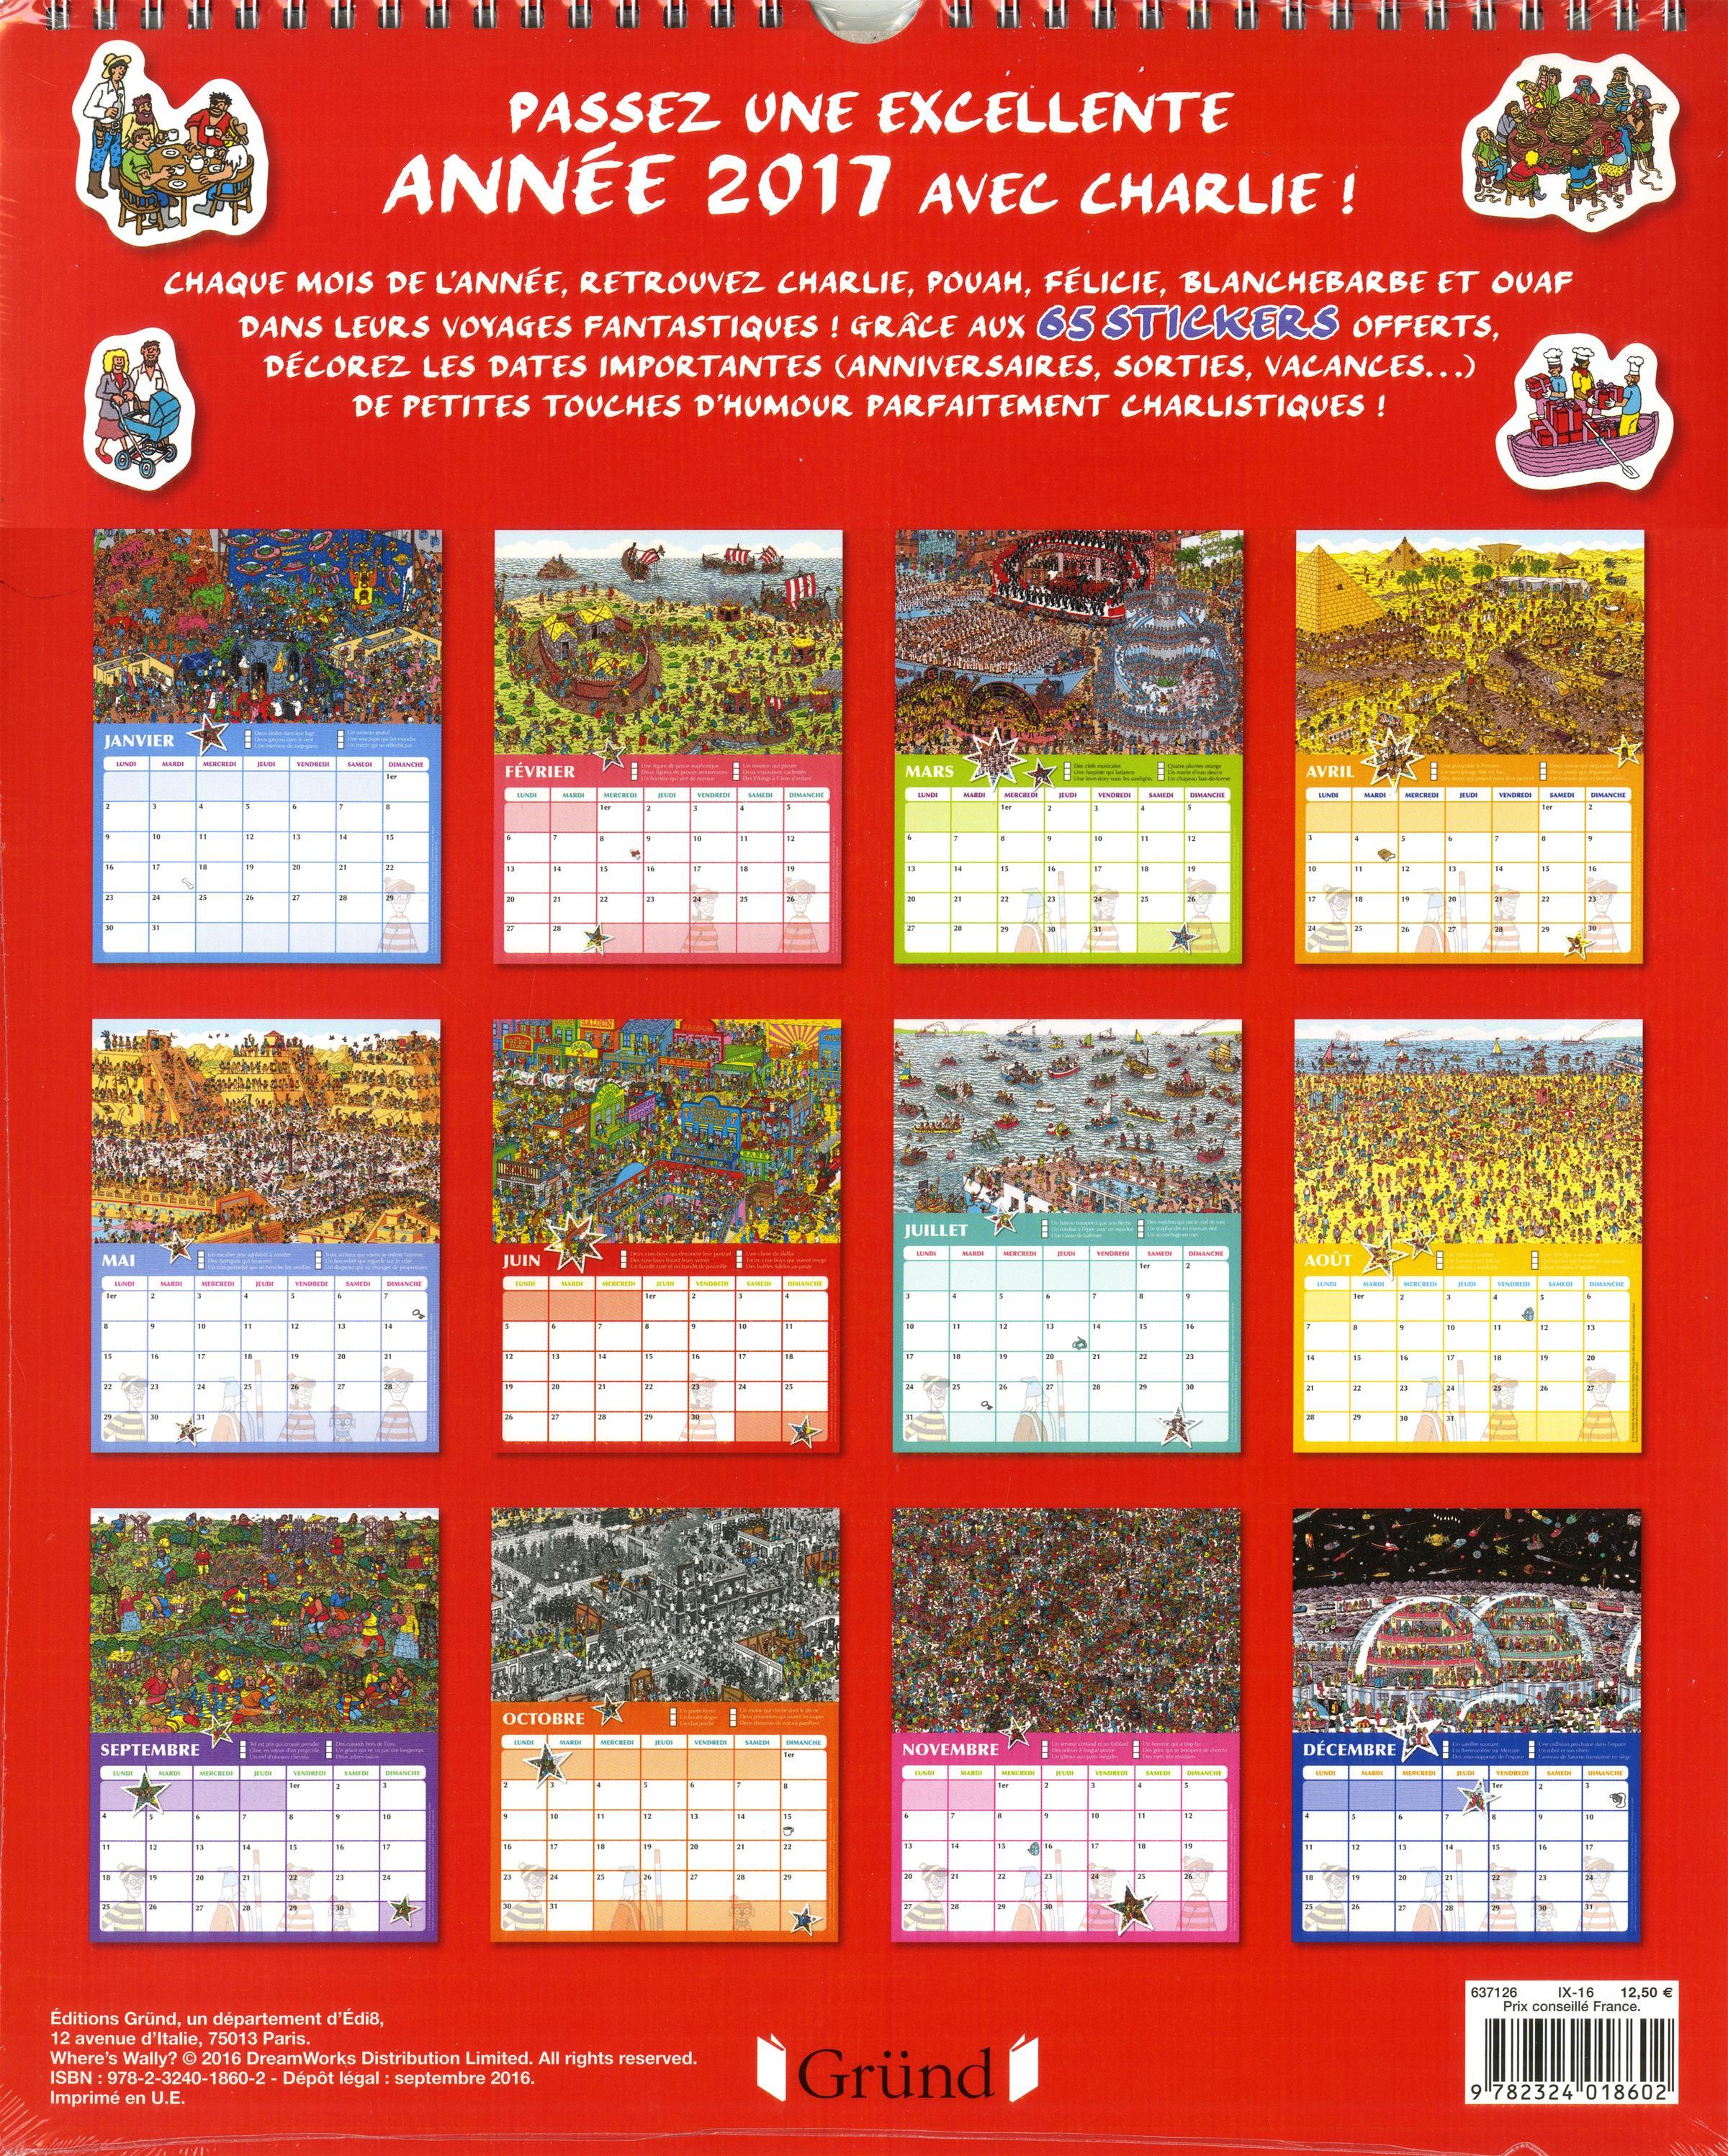 Livre o est charlie le grand calendrier 2017 for Grand calendrier mural 2017